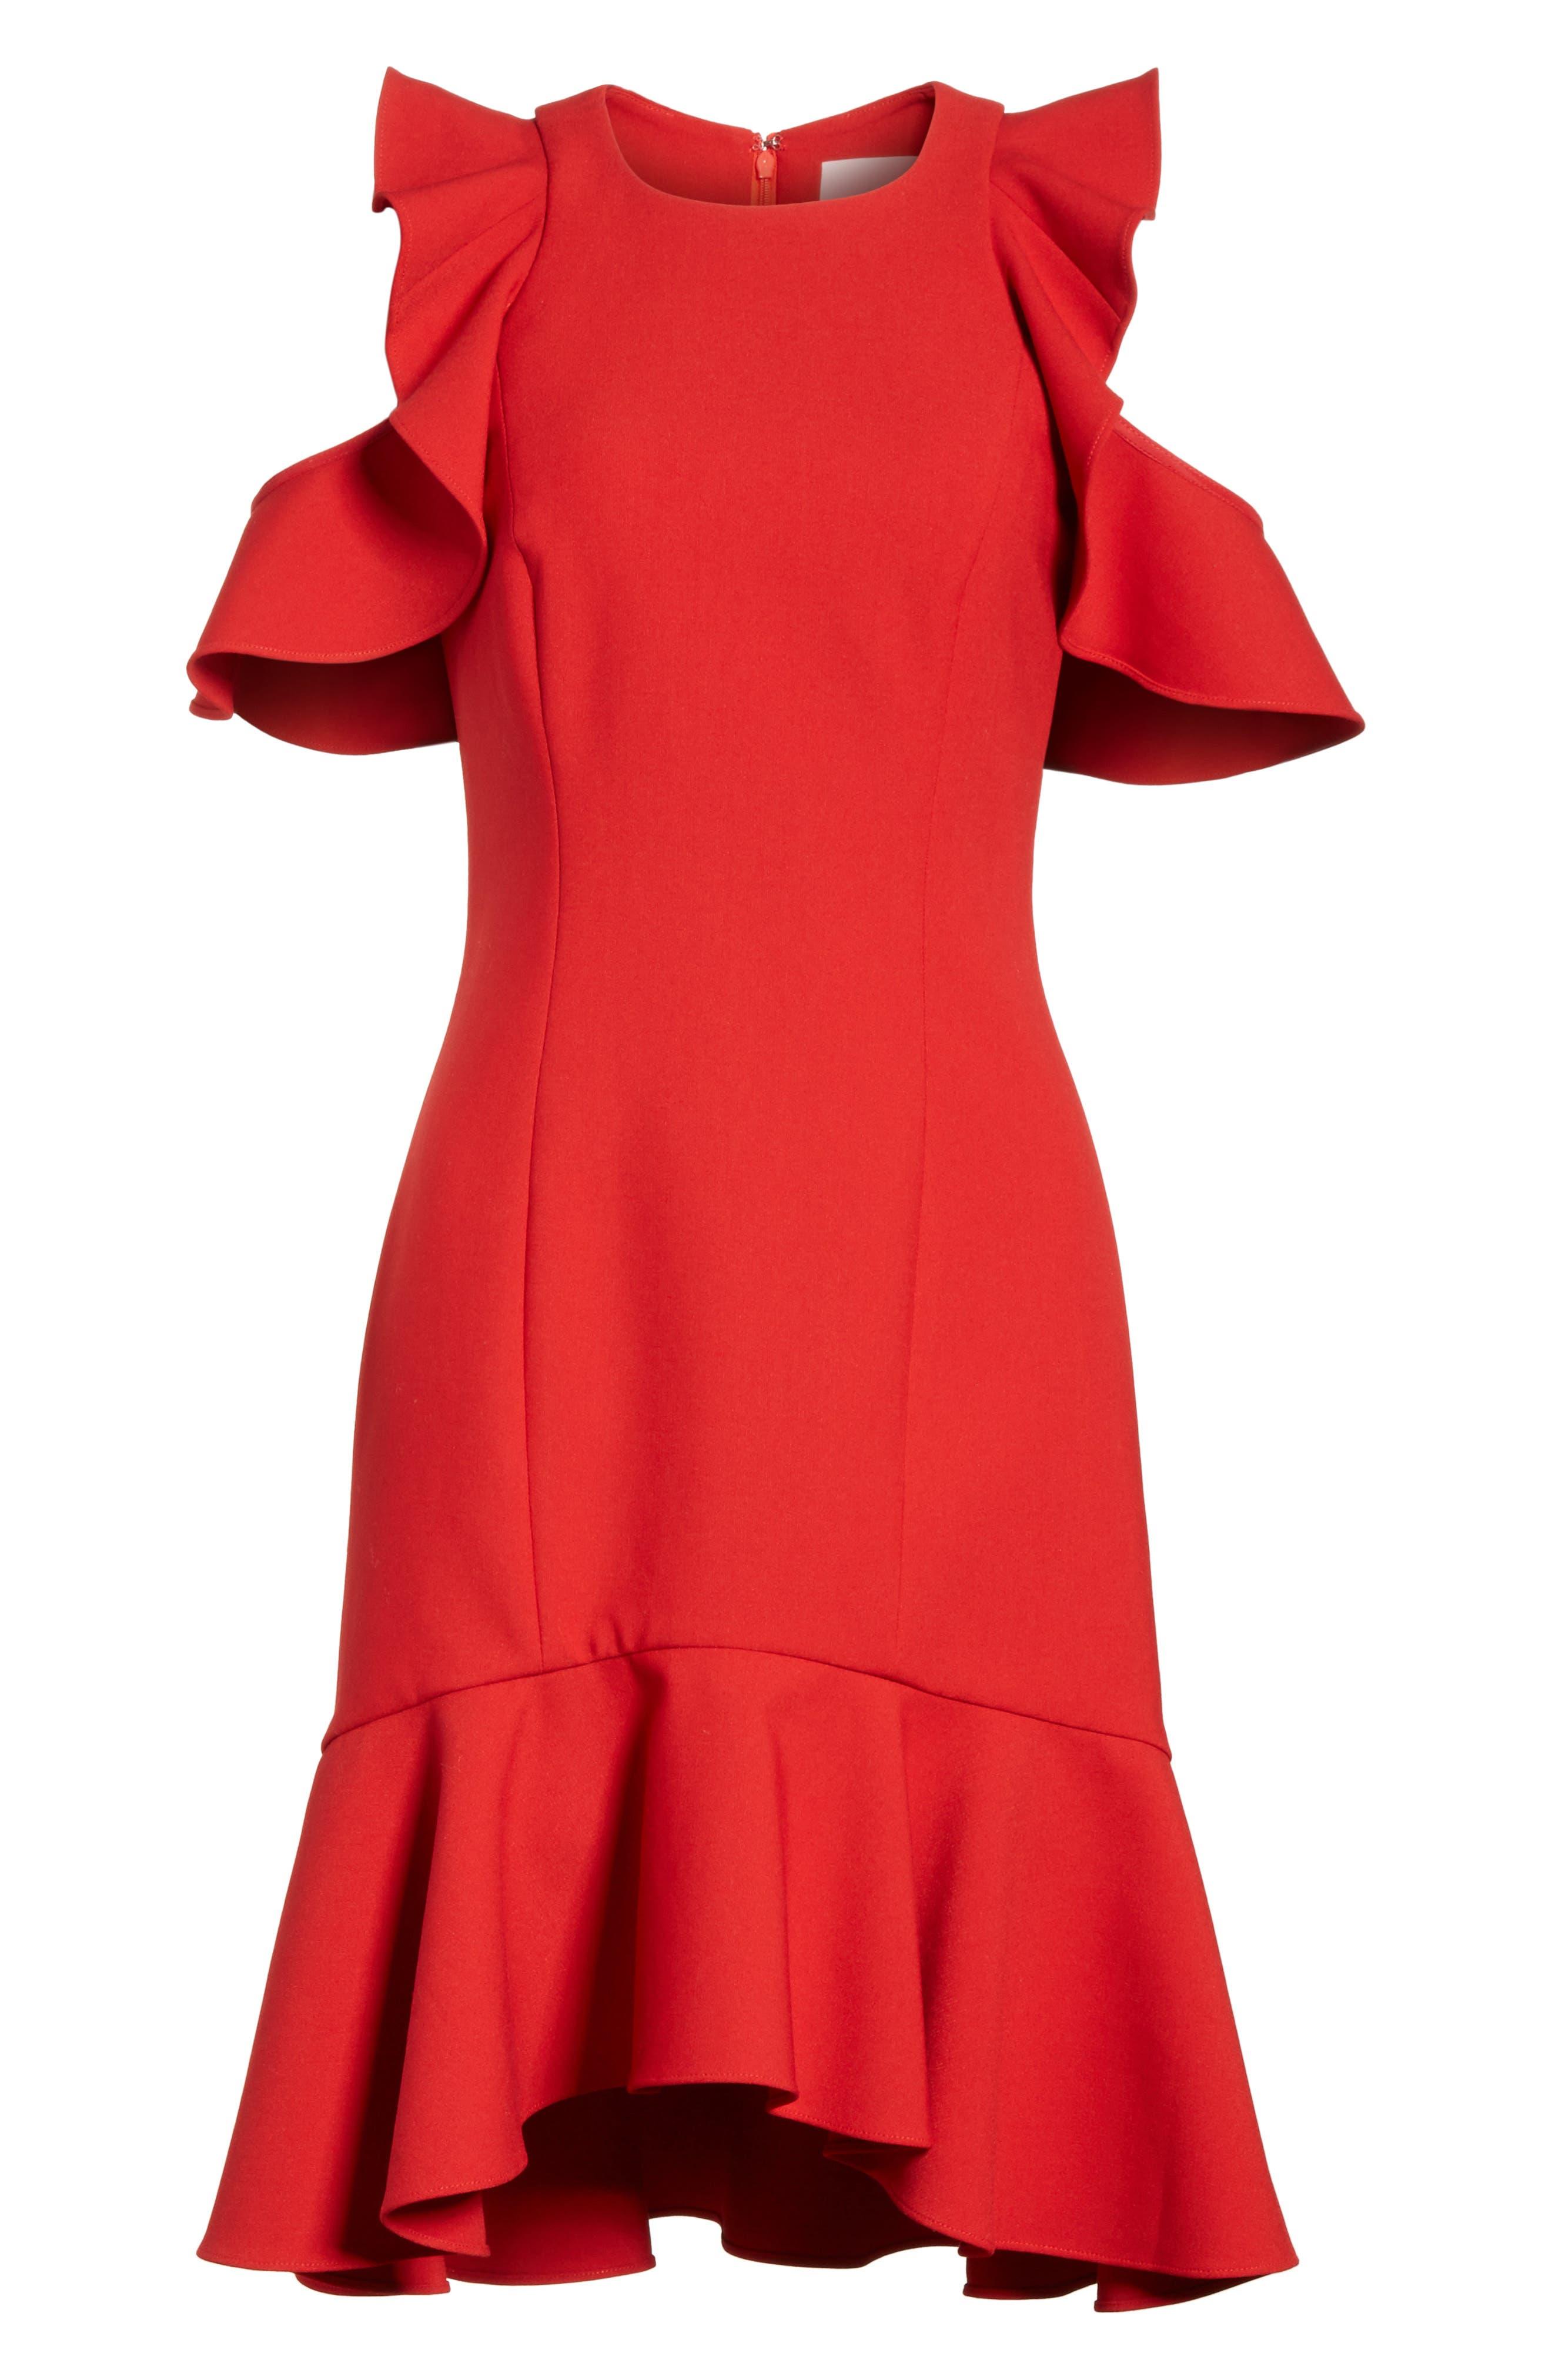 Micah Ruffle Cold Shoulder Dress,                             Alternate thumbnail 6, color,                             641